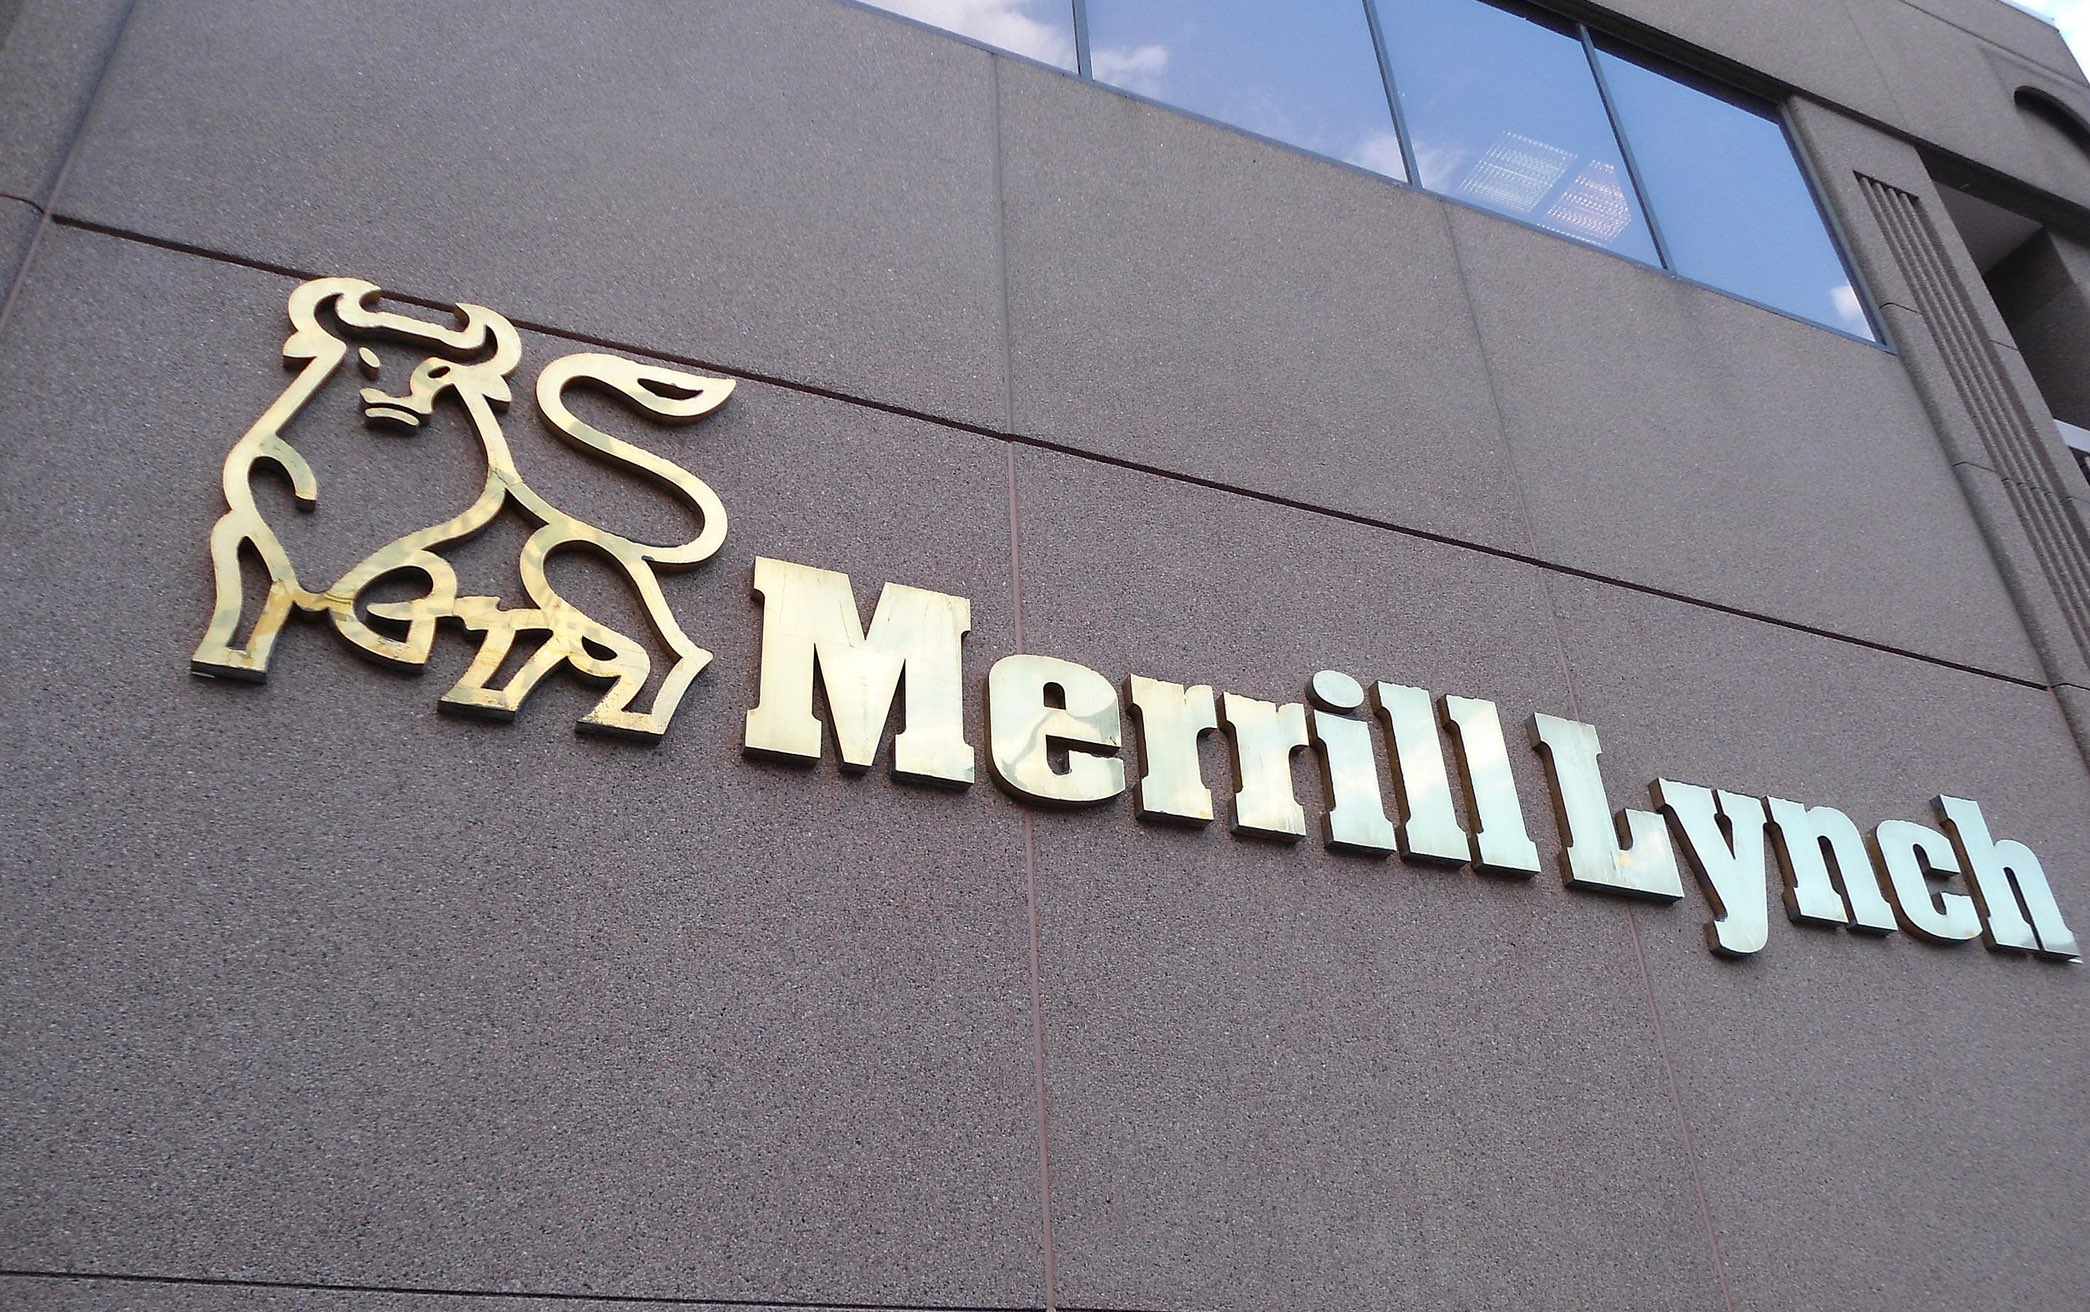 merrill-lynch-bank-of-america